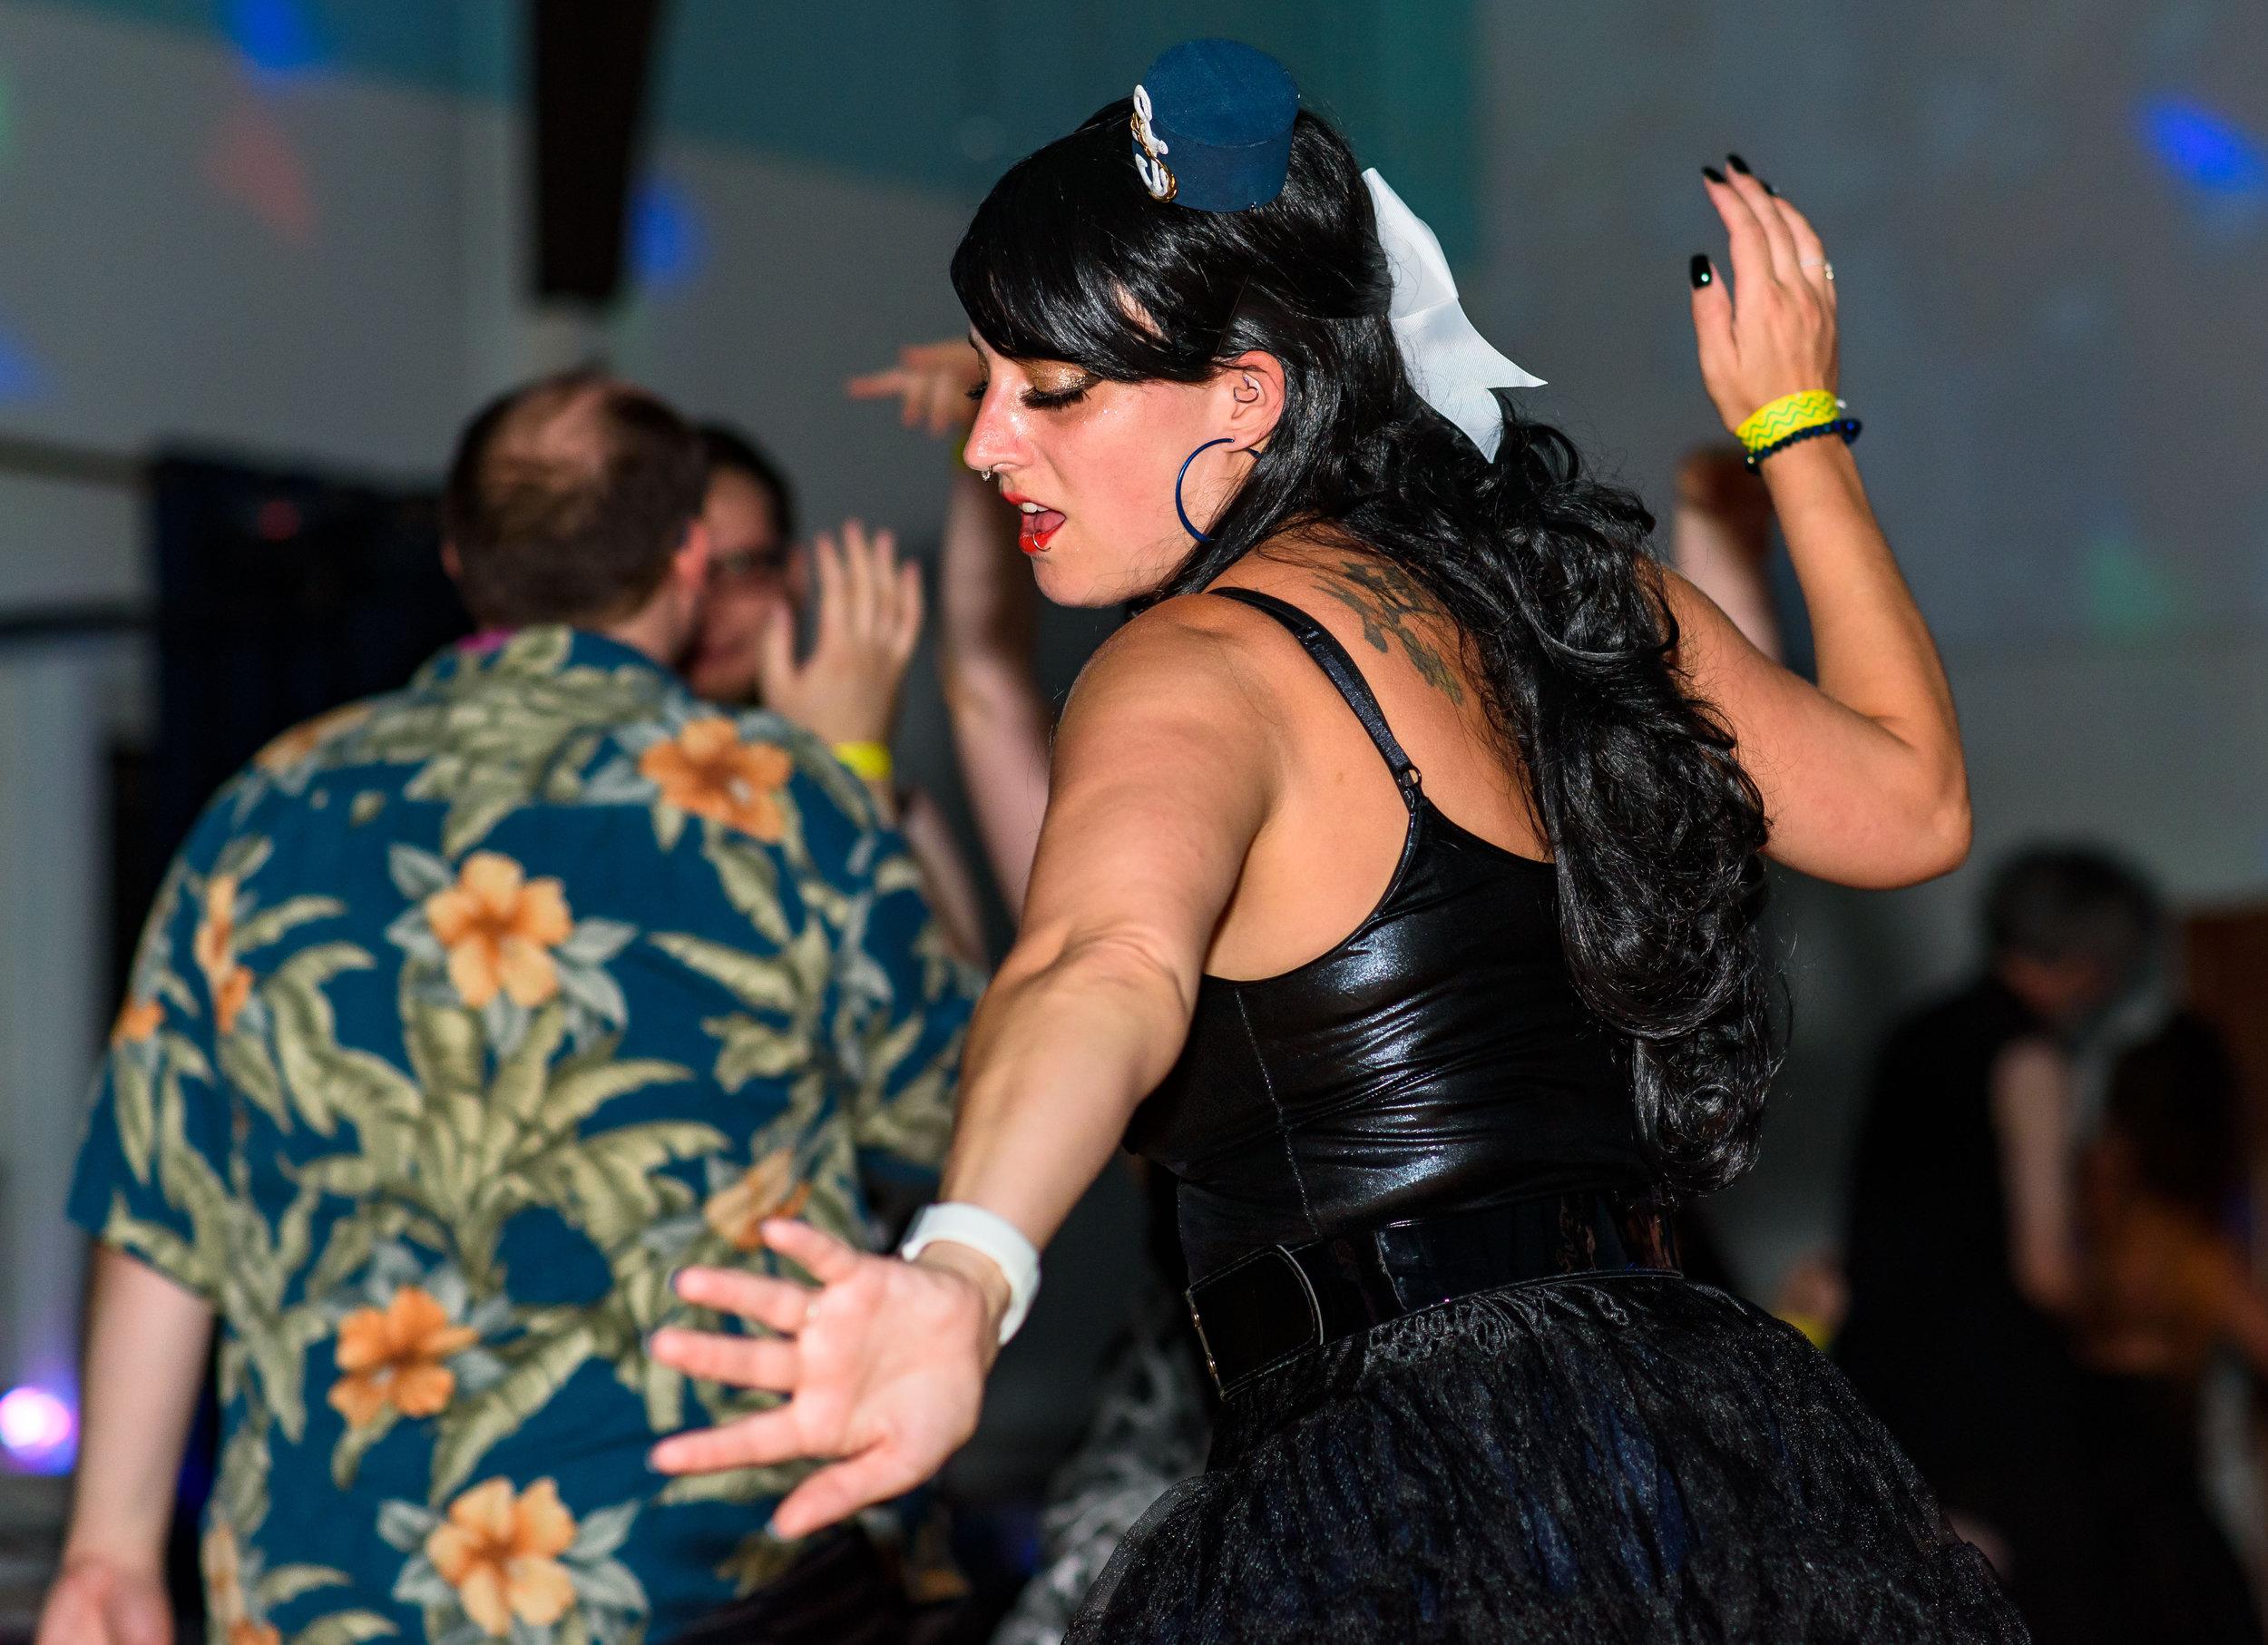 2019-TheHaven Club - Beach Party (45).jpg